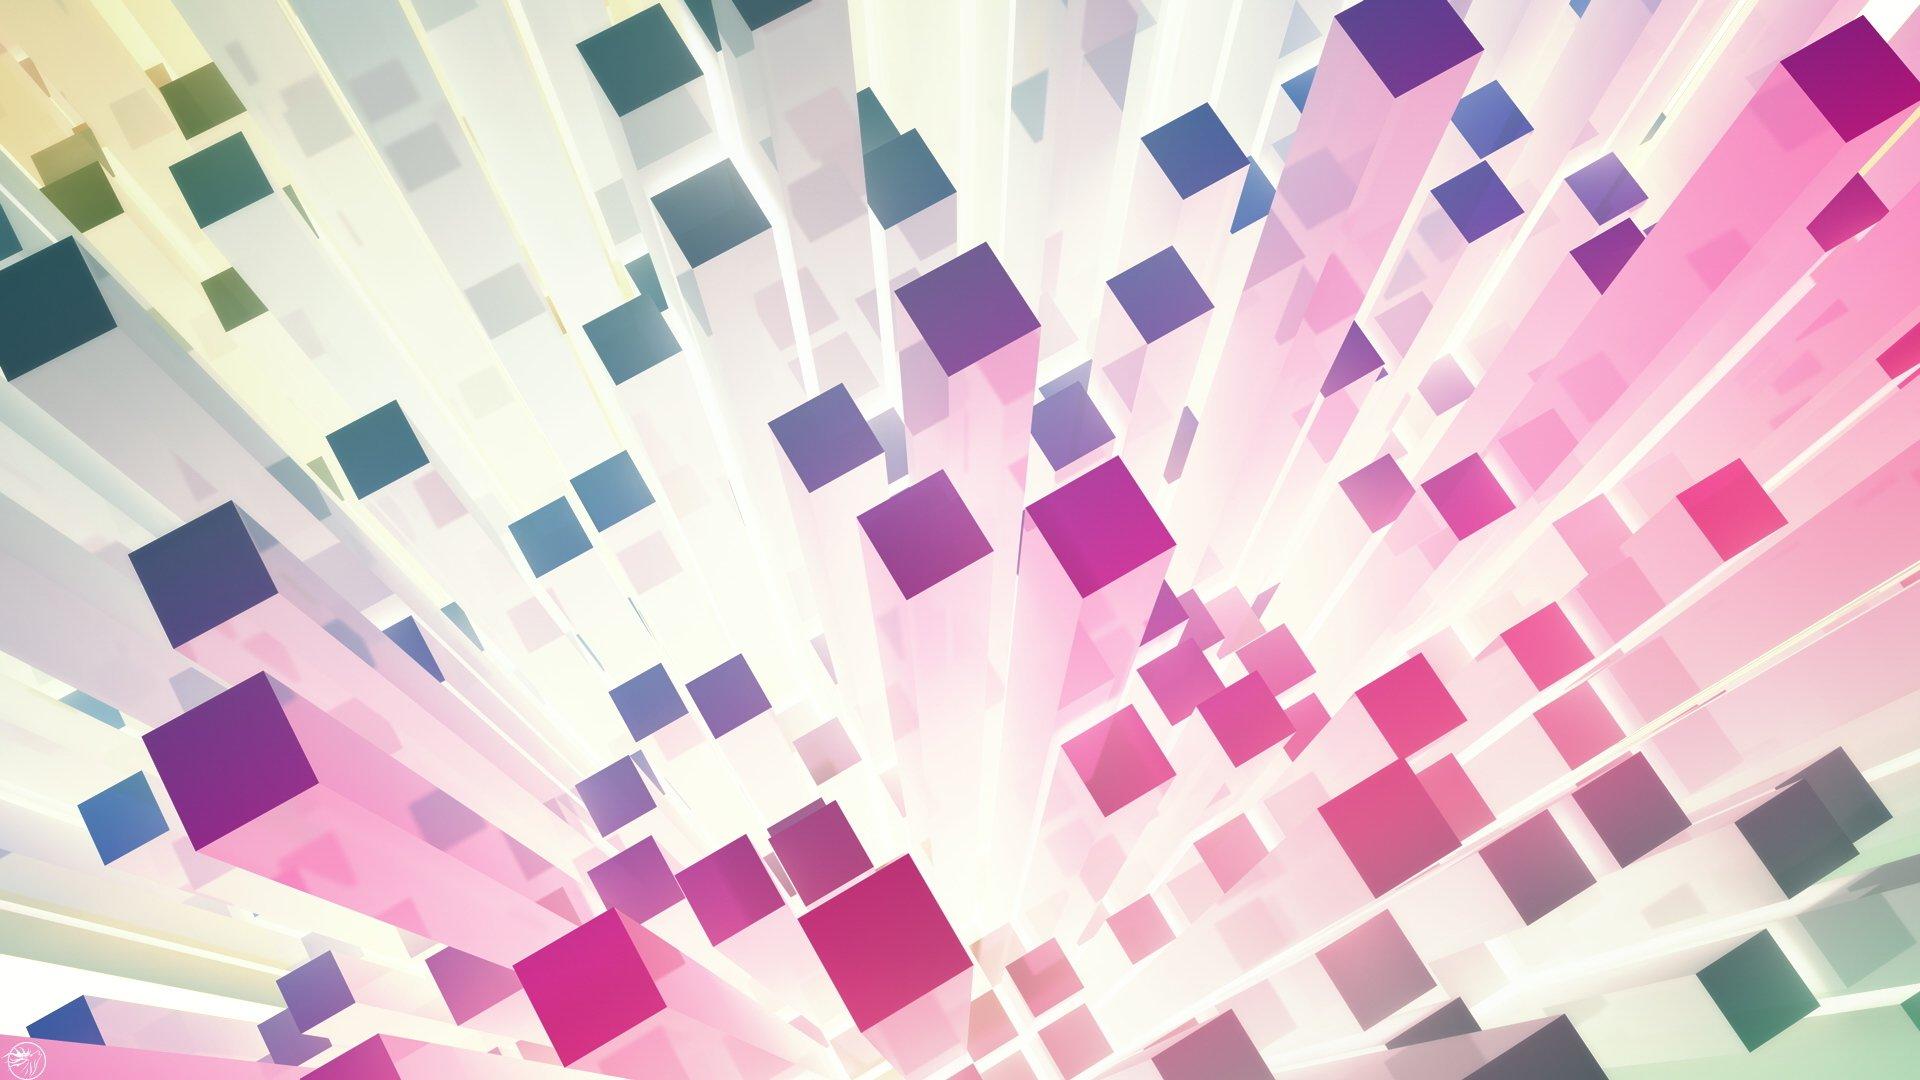 Обои полосы, фигуры, абстракции, Квадраты. Абстракции foto 8